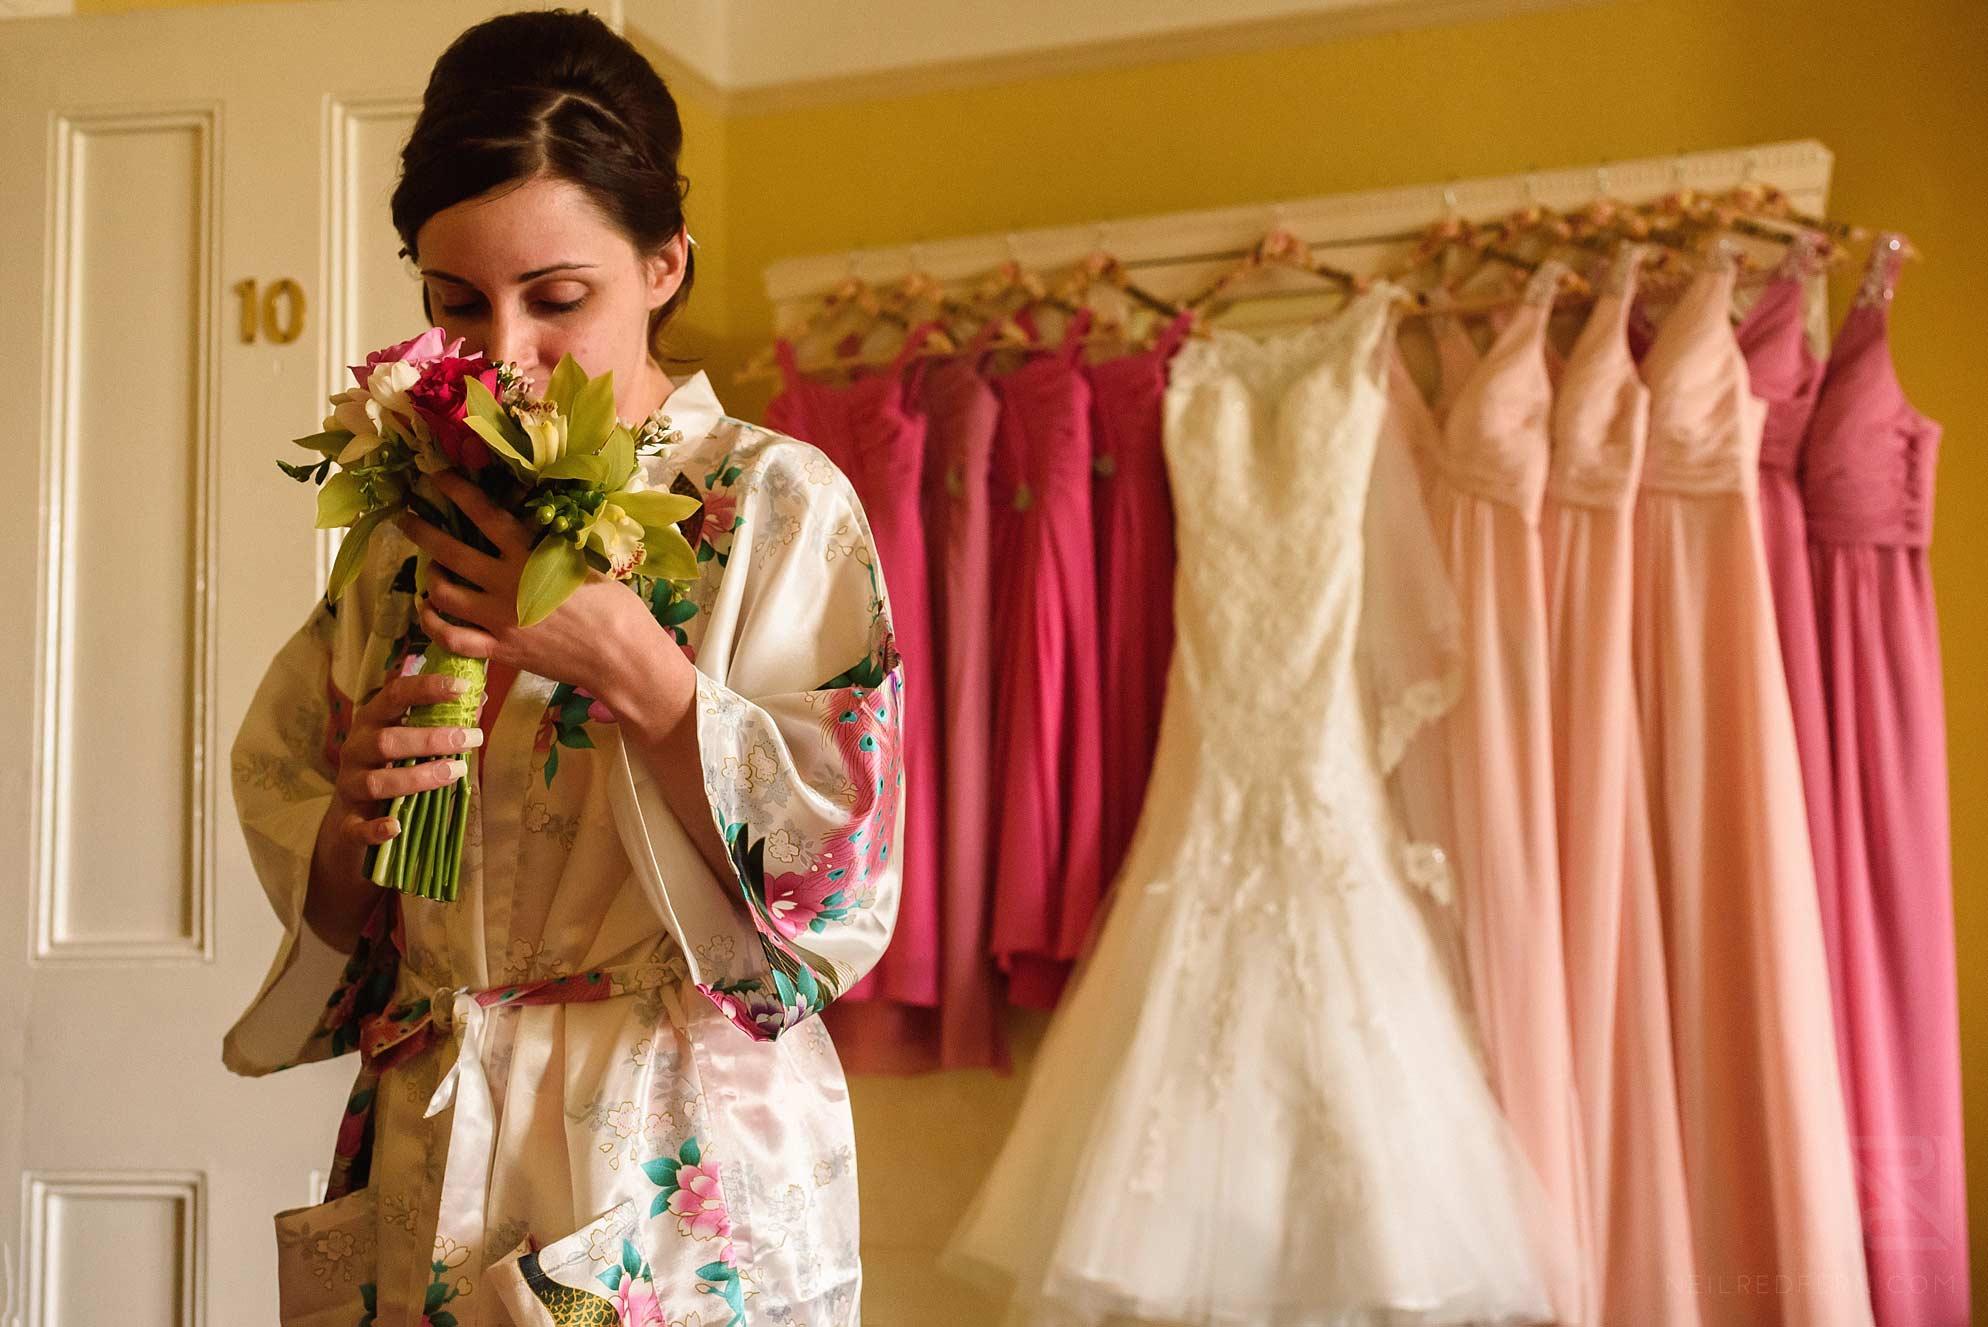 Metropole-Hotel-Llandrindod-Wells-wedding-03